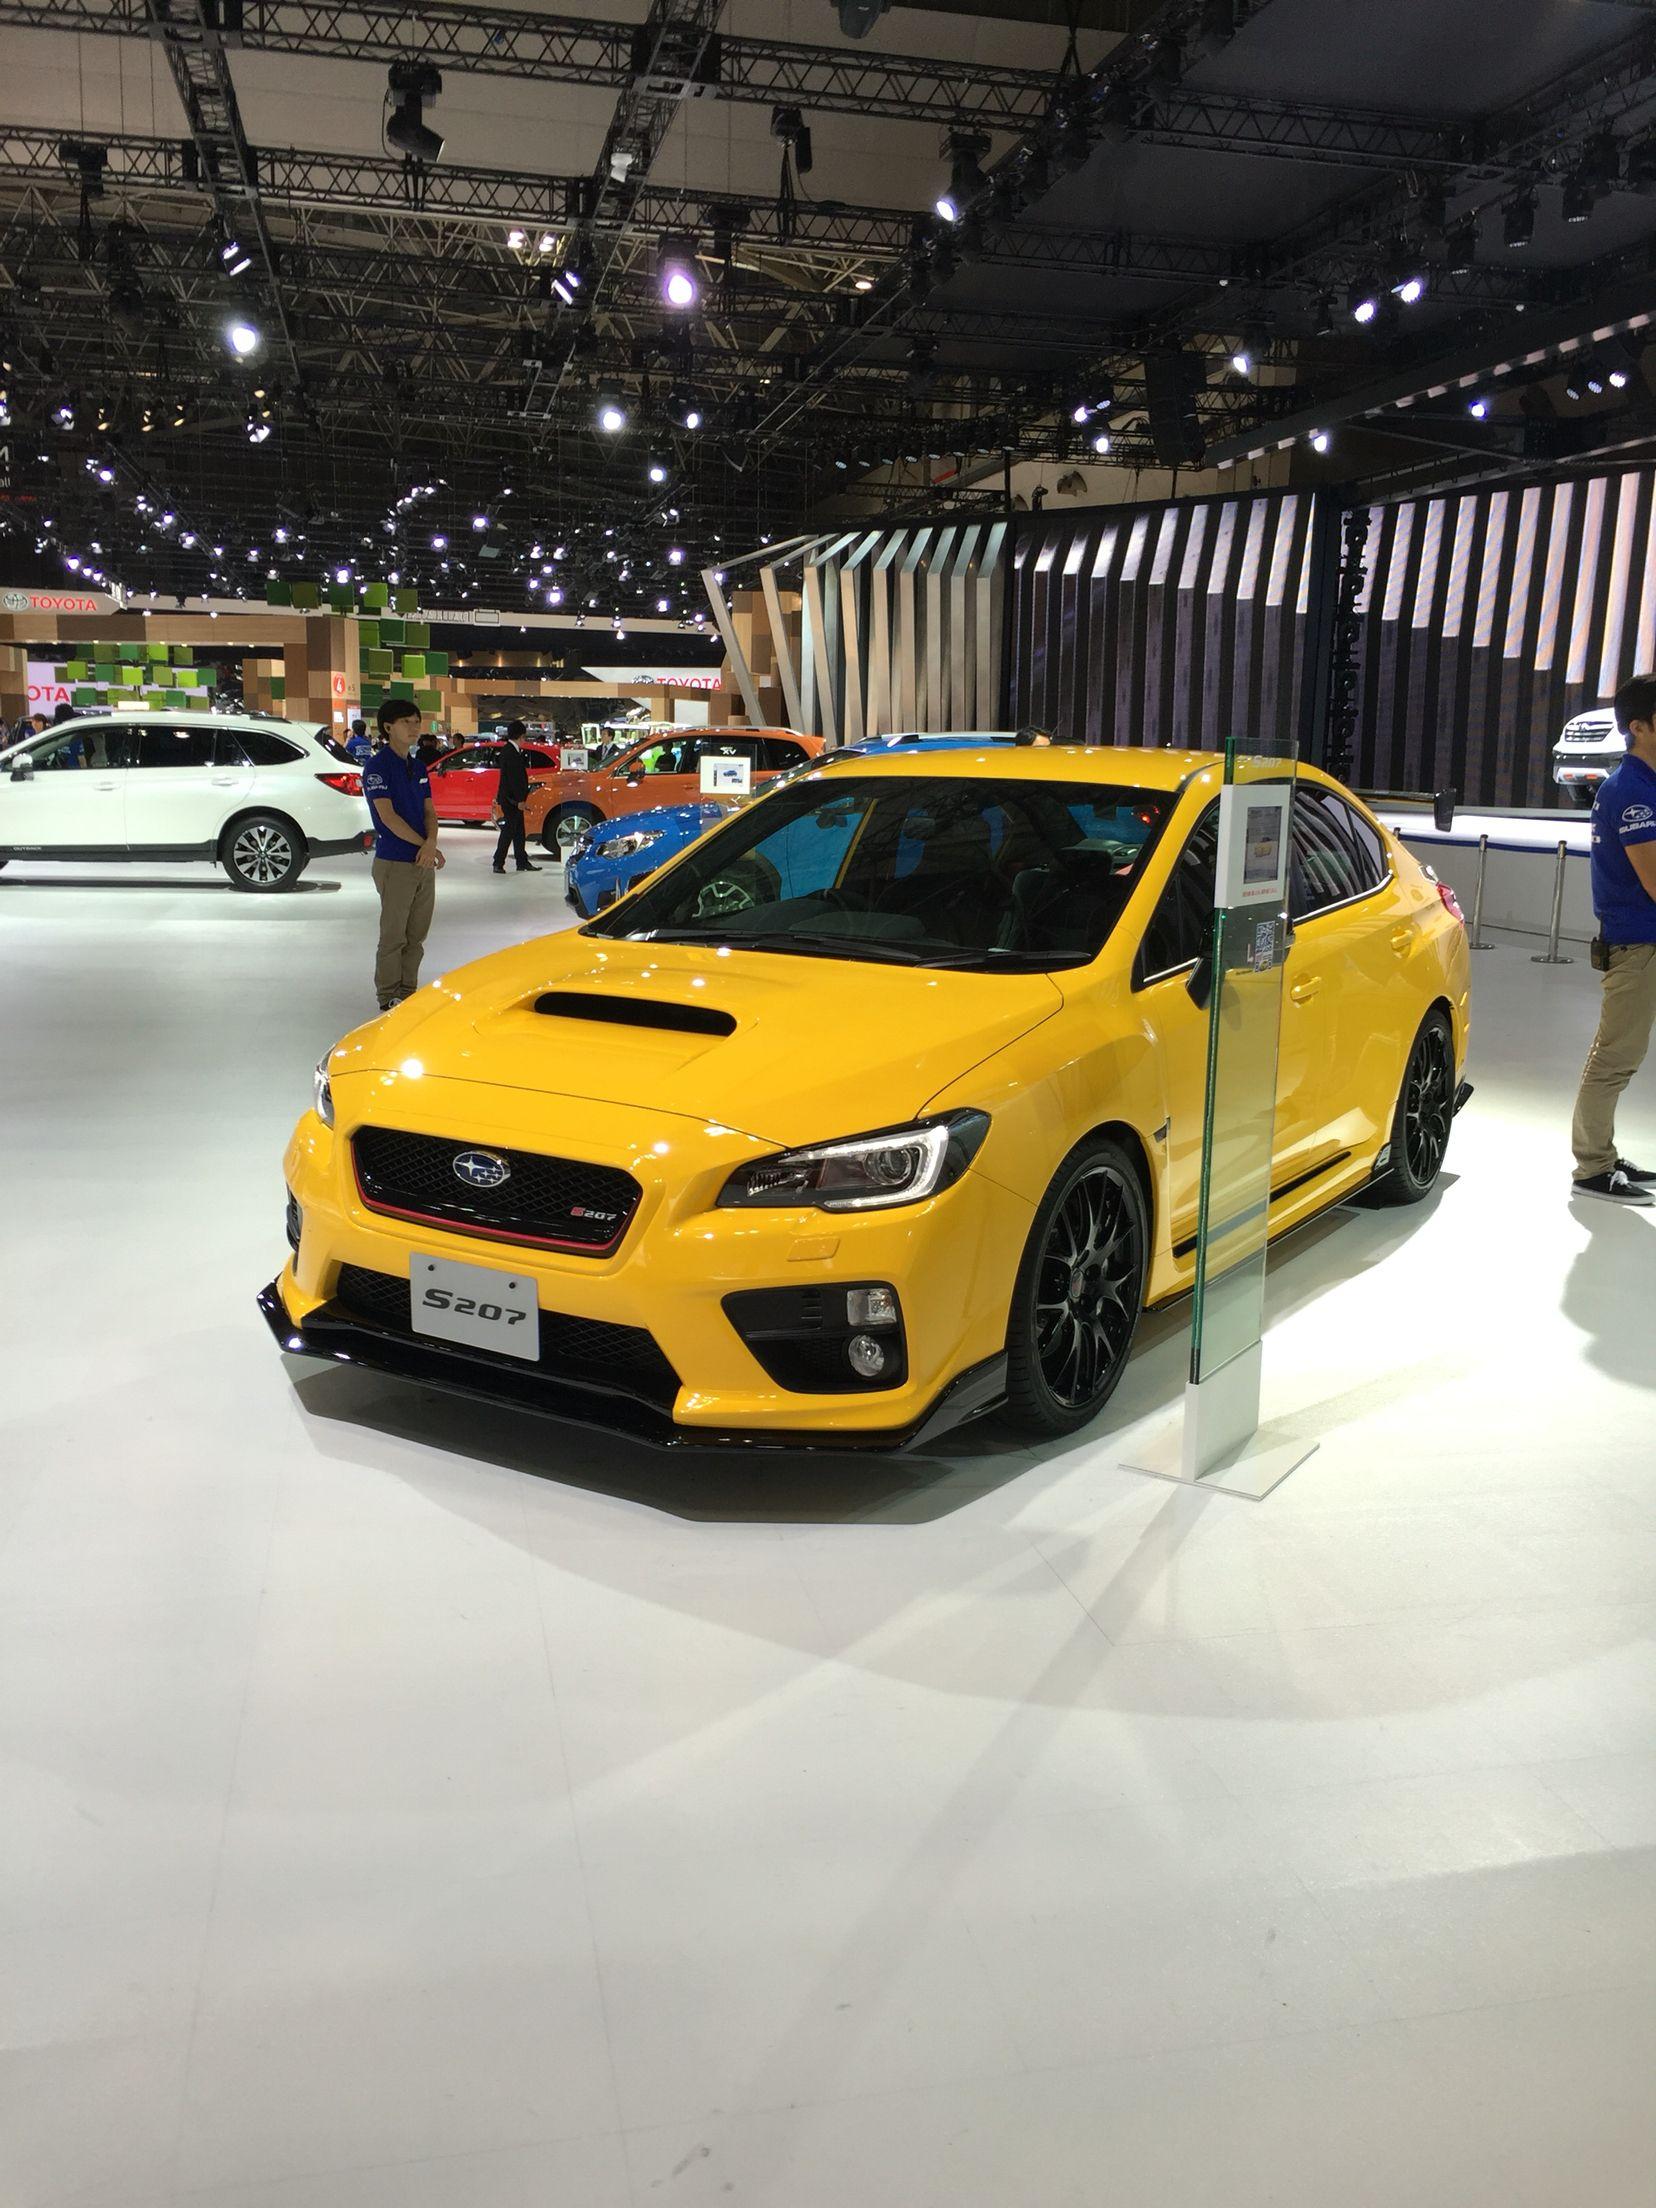 Subaru Wrx Sti S207 Subaru Subaru Levorg Tokyo Motor Show